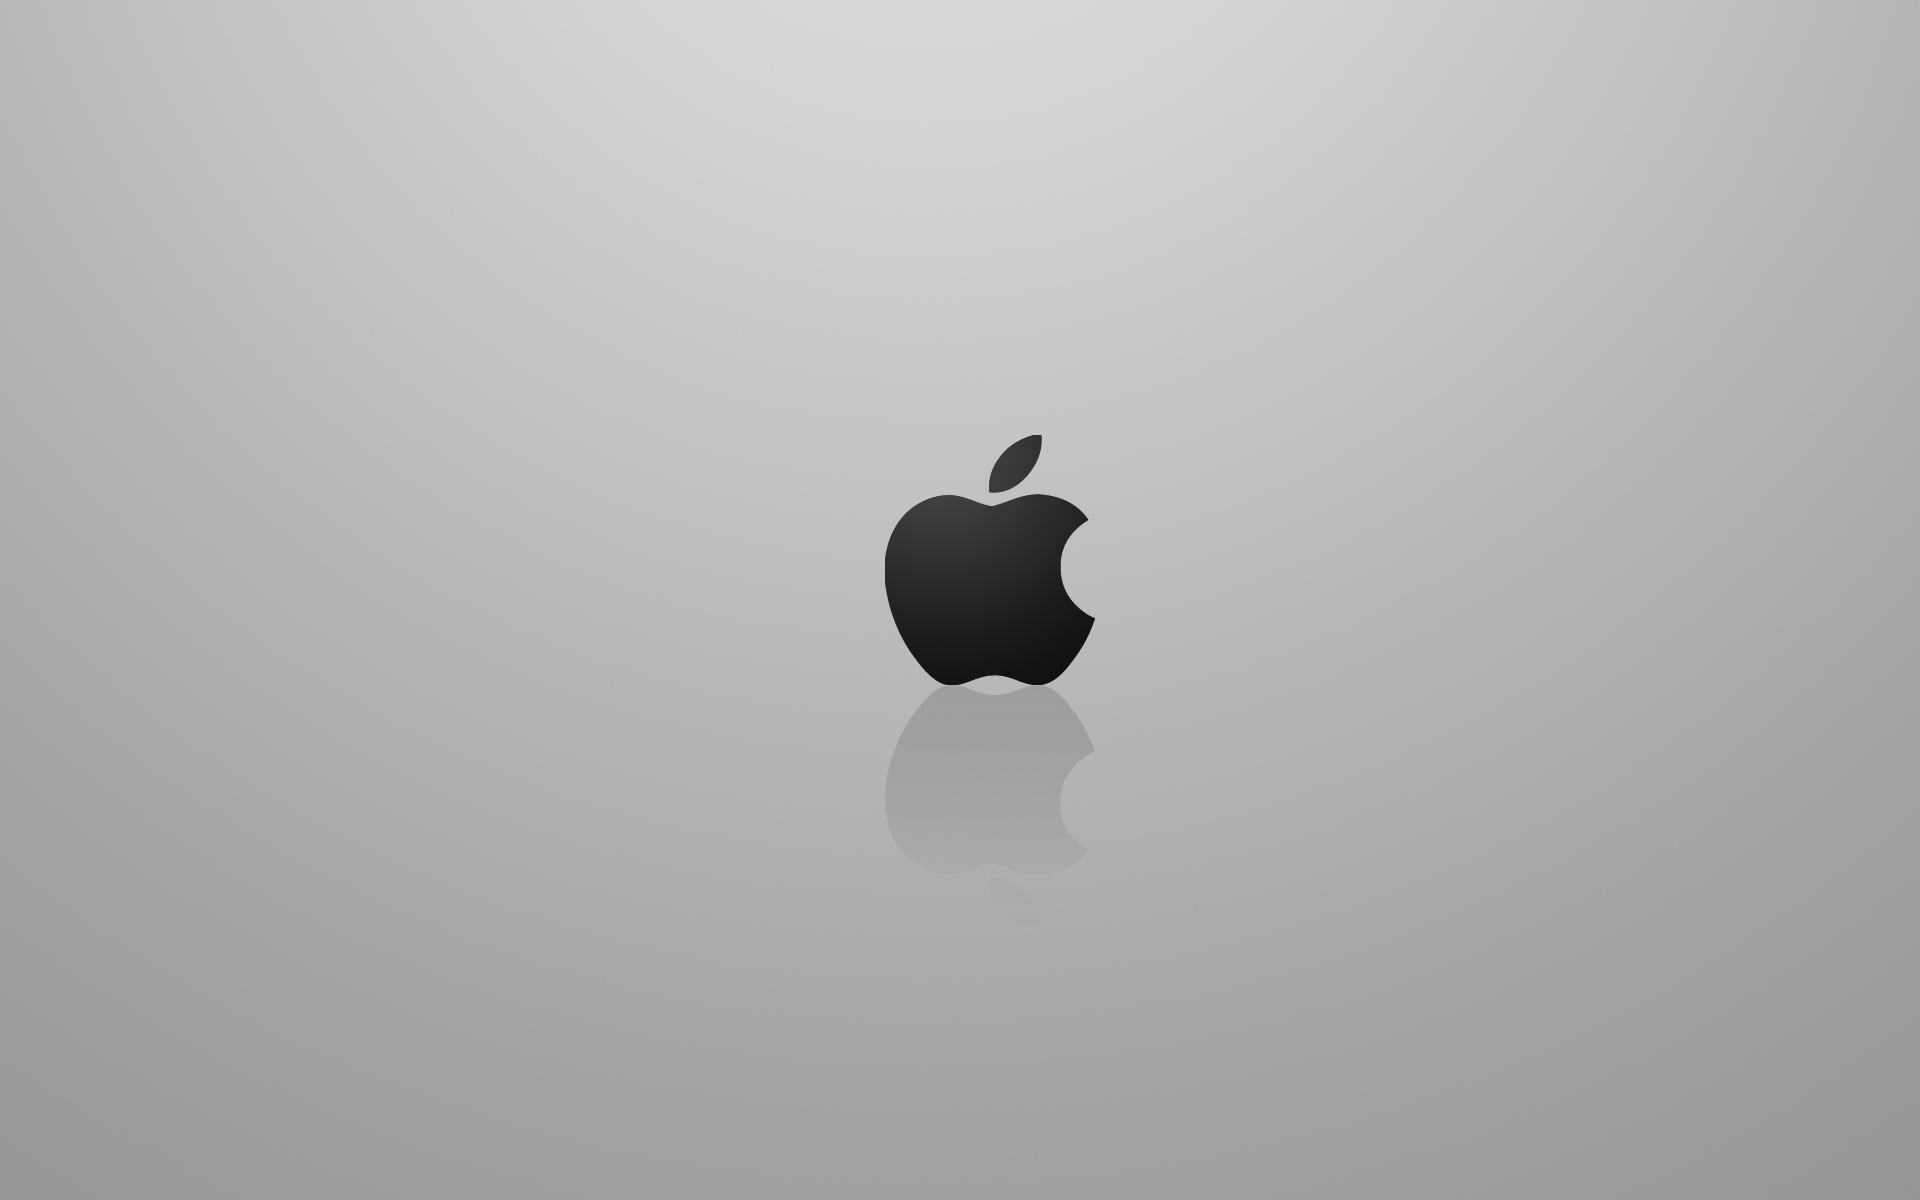 apple mac wallpaper for windows download hd wallpapers